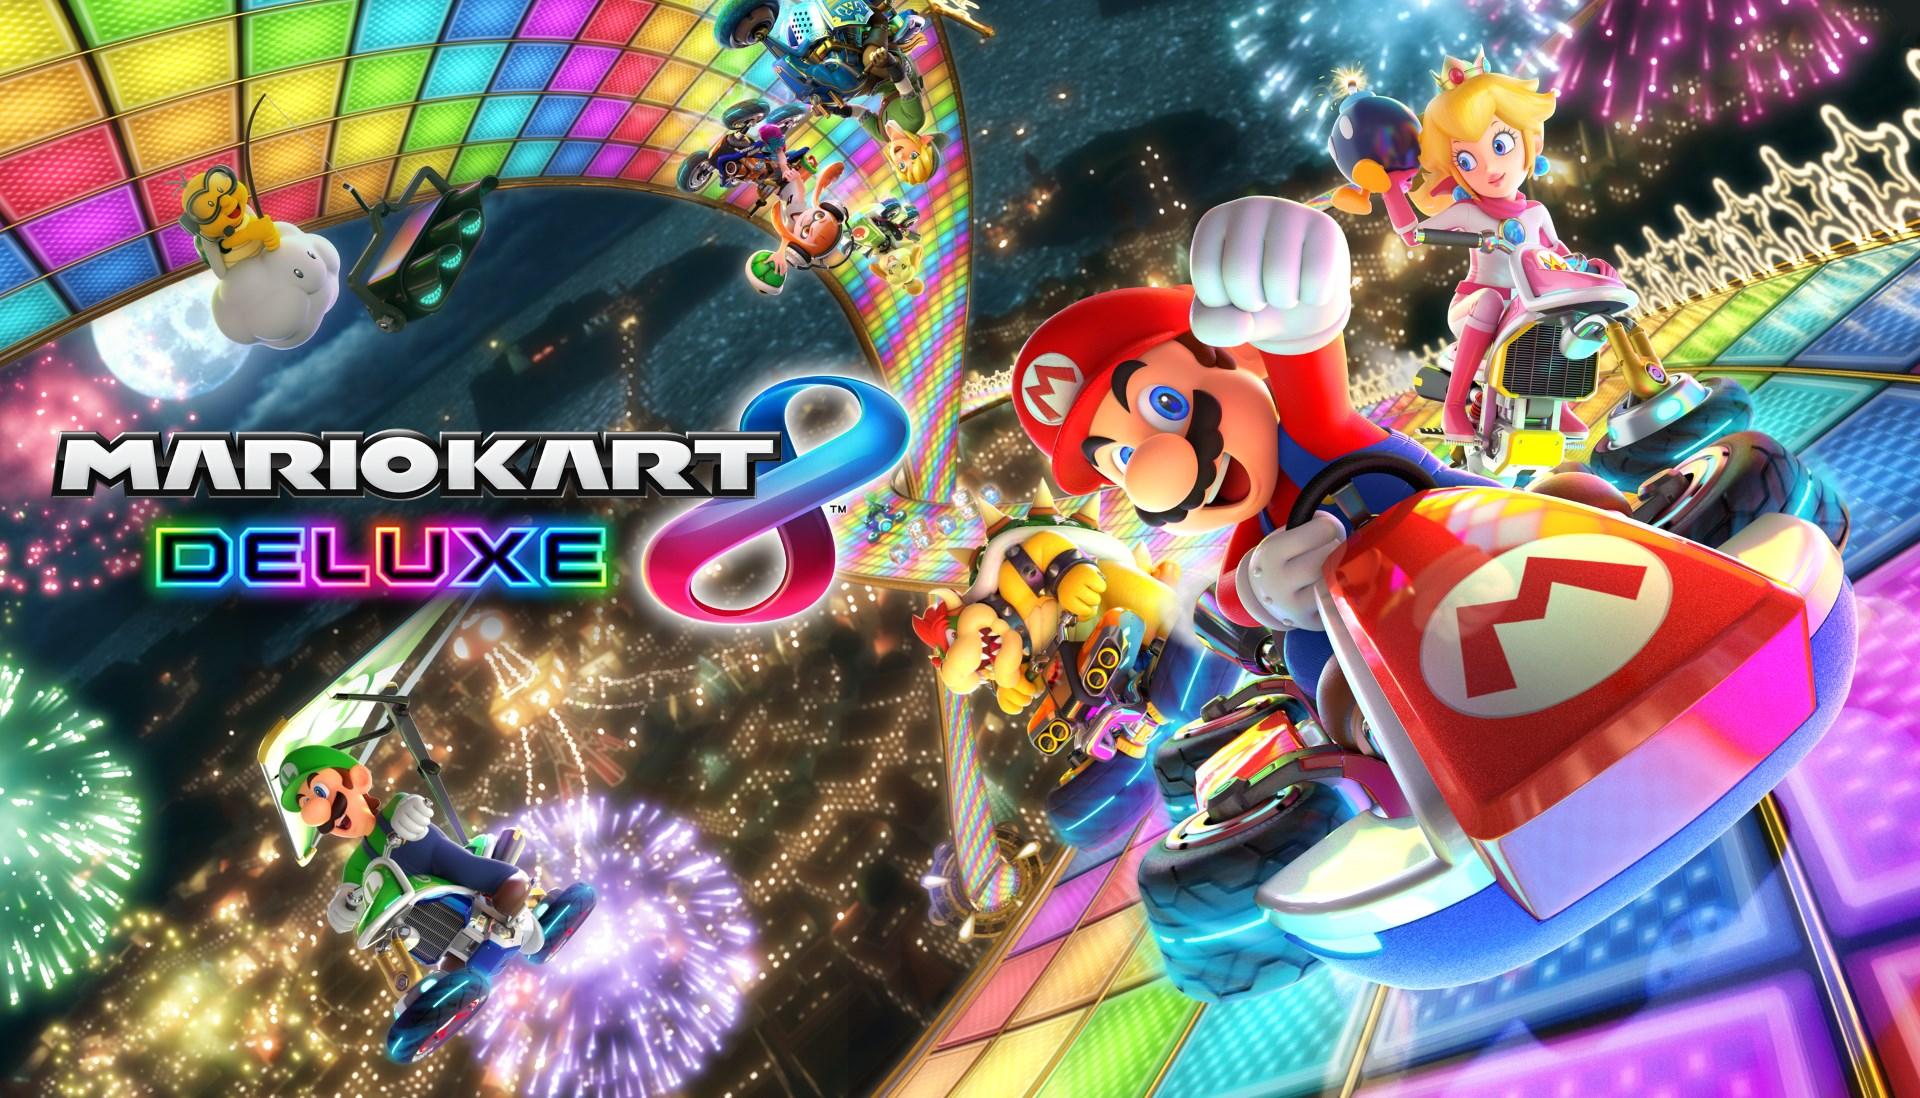 Mario Kart 8 Deluxe Review - GodisaGeek com